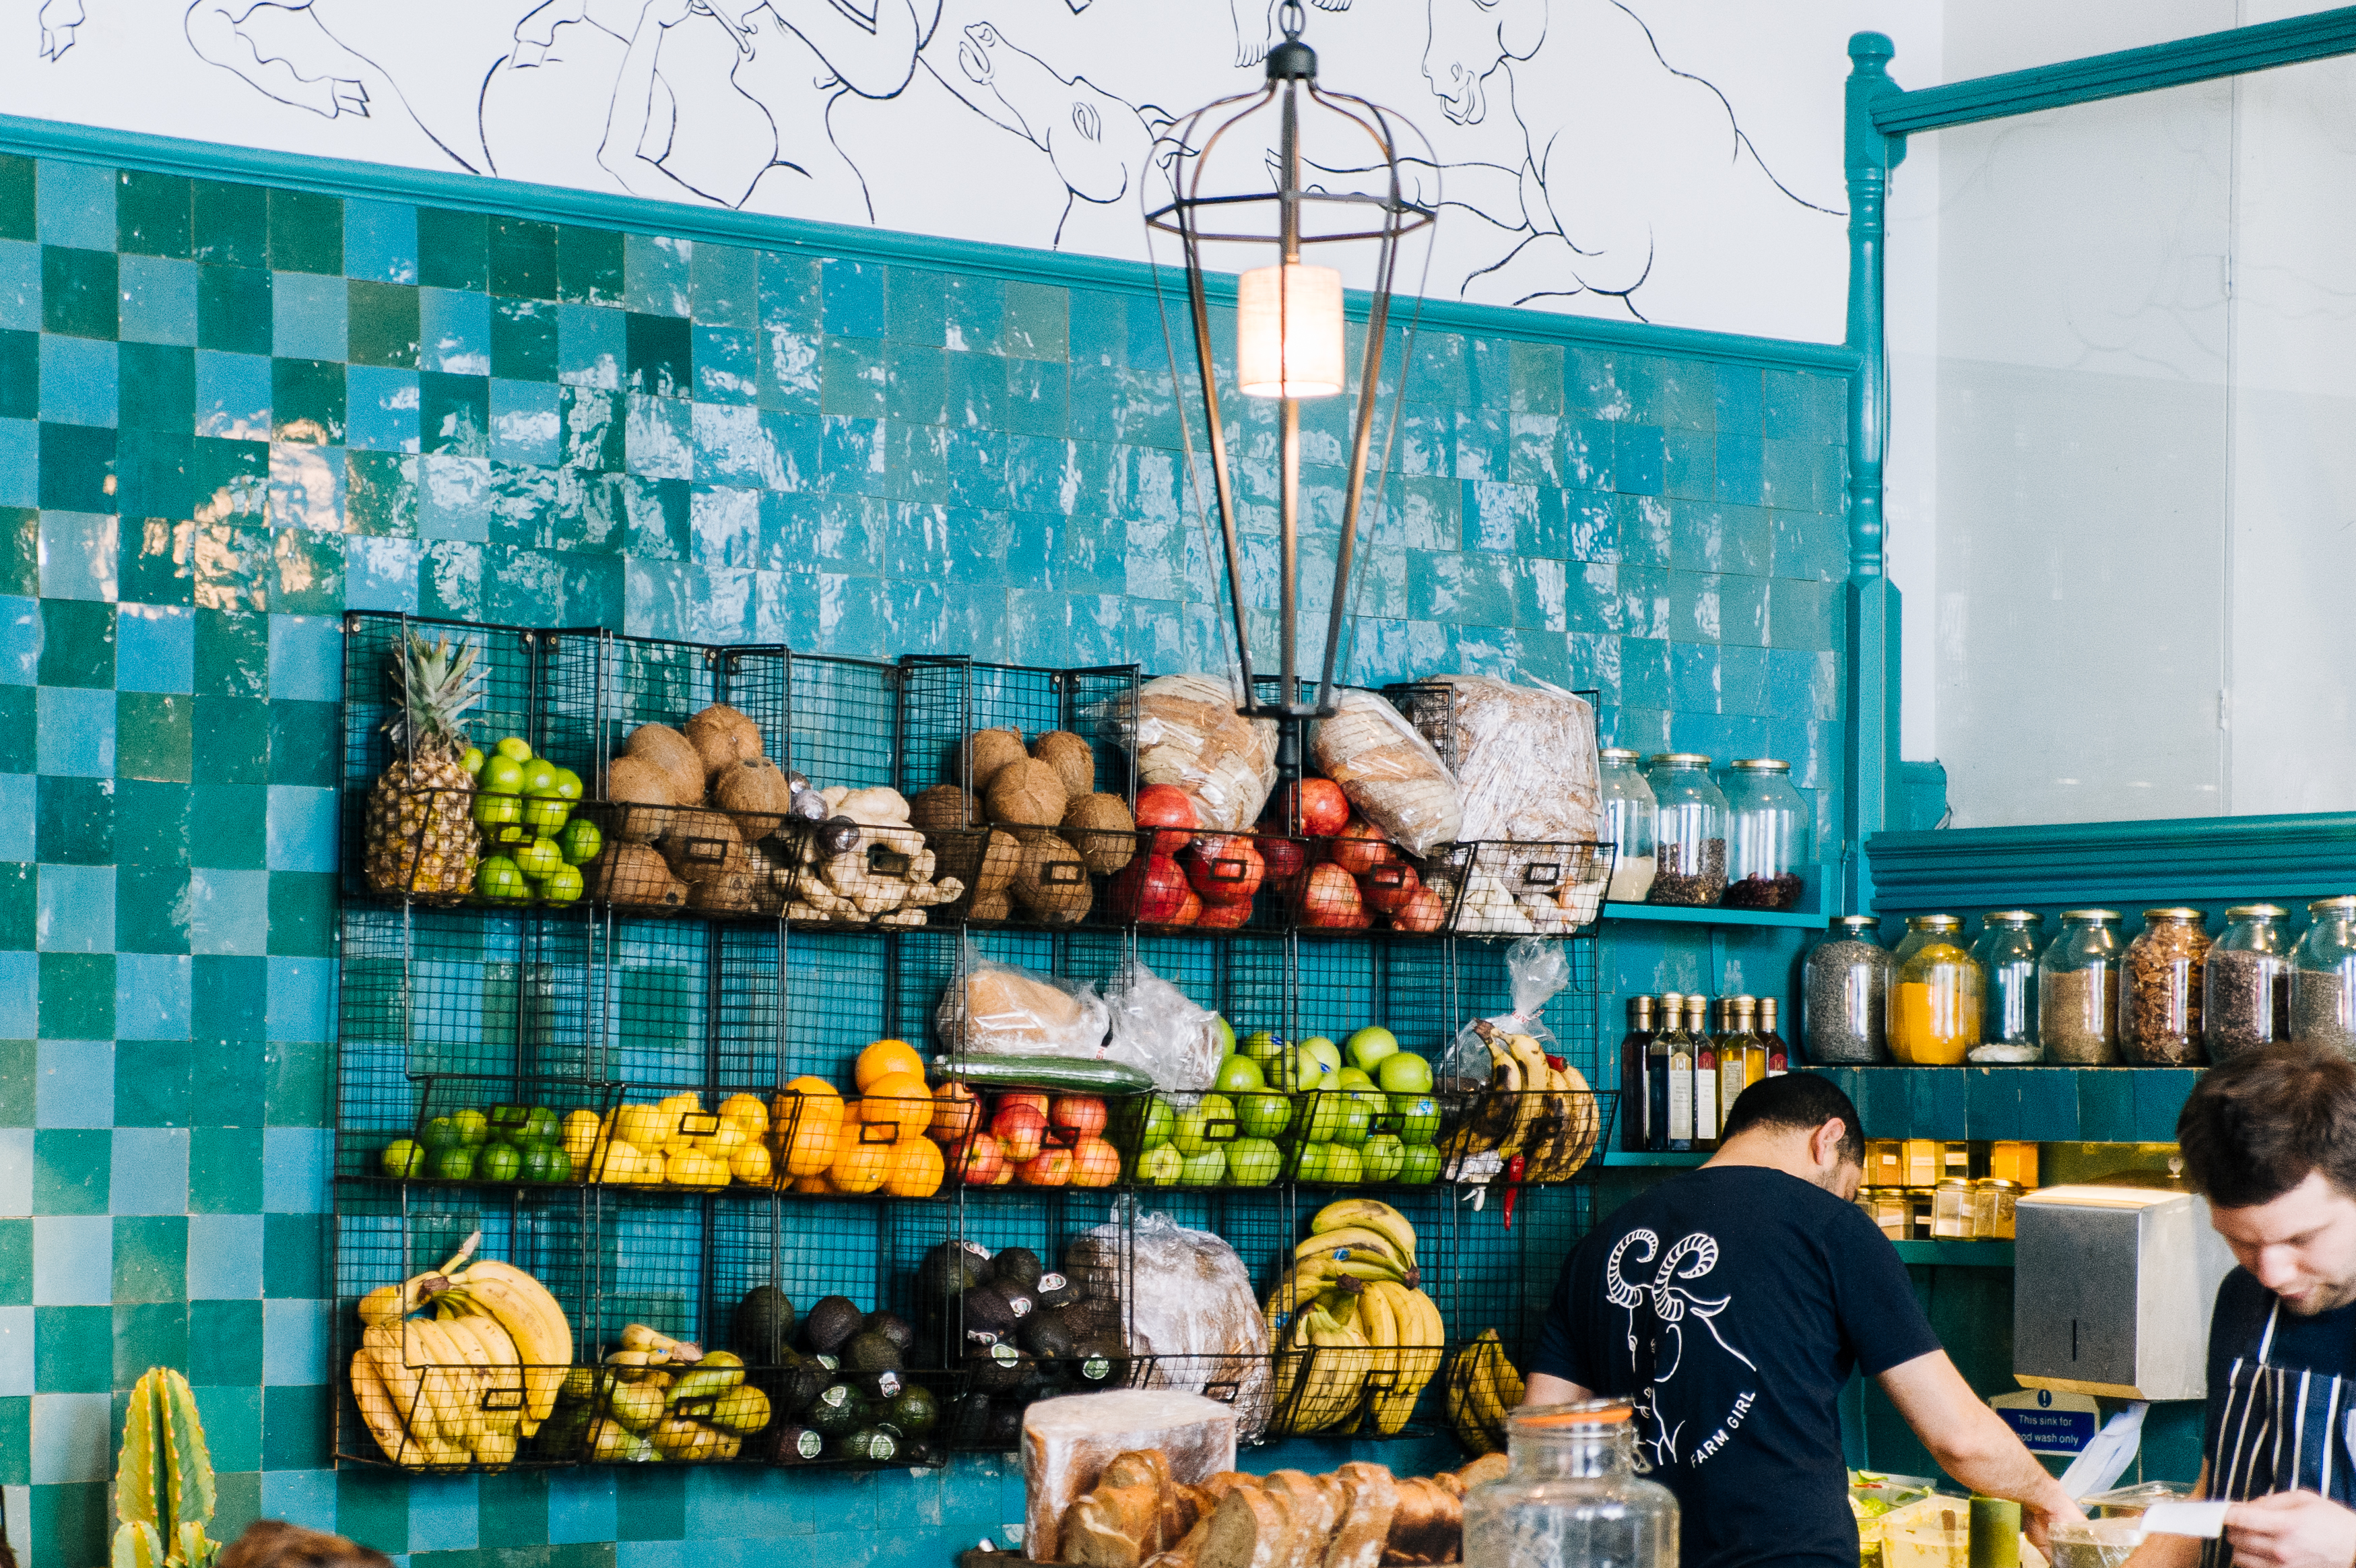 gap store valencia spain